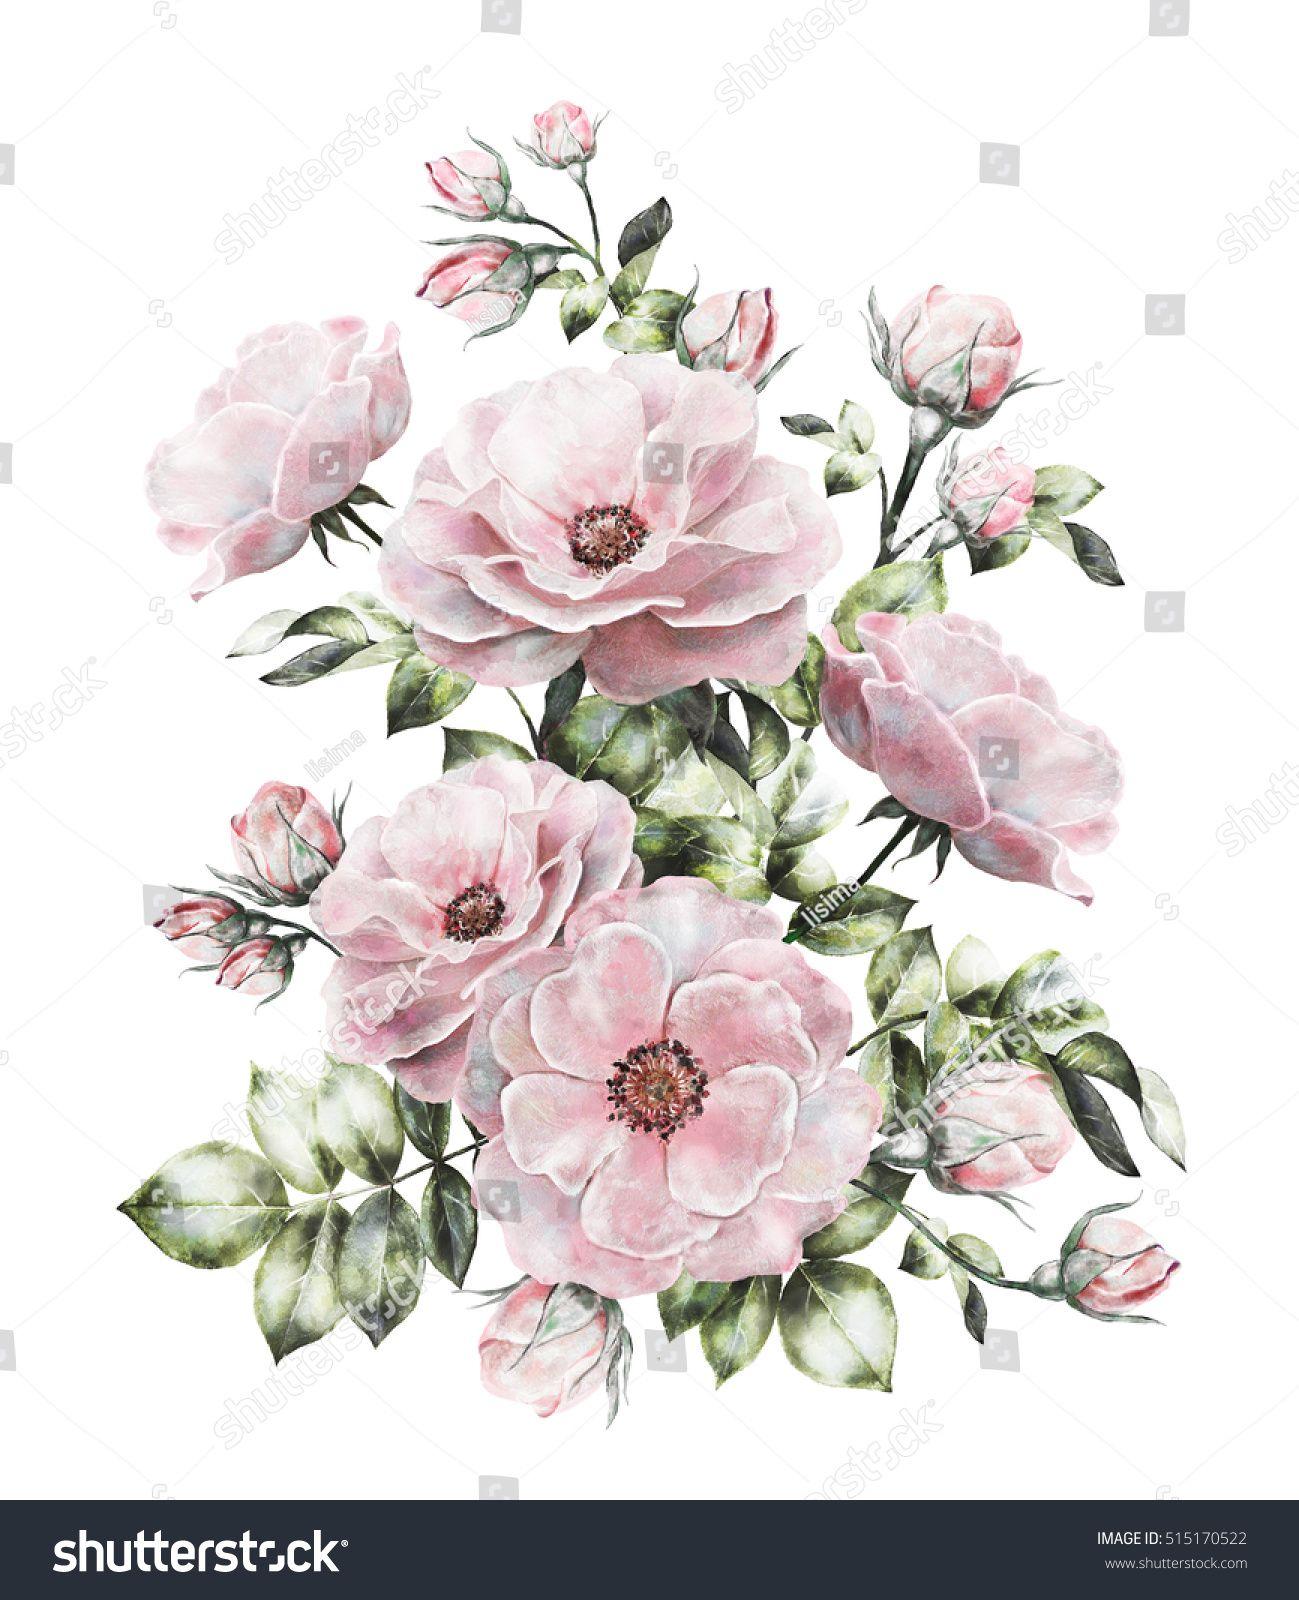 Vintage Watercolor Flowers Floral Illustration Flower In Pastel